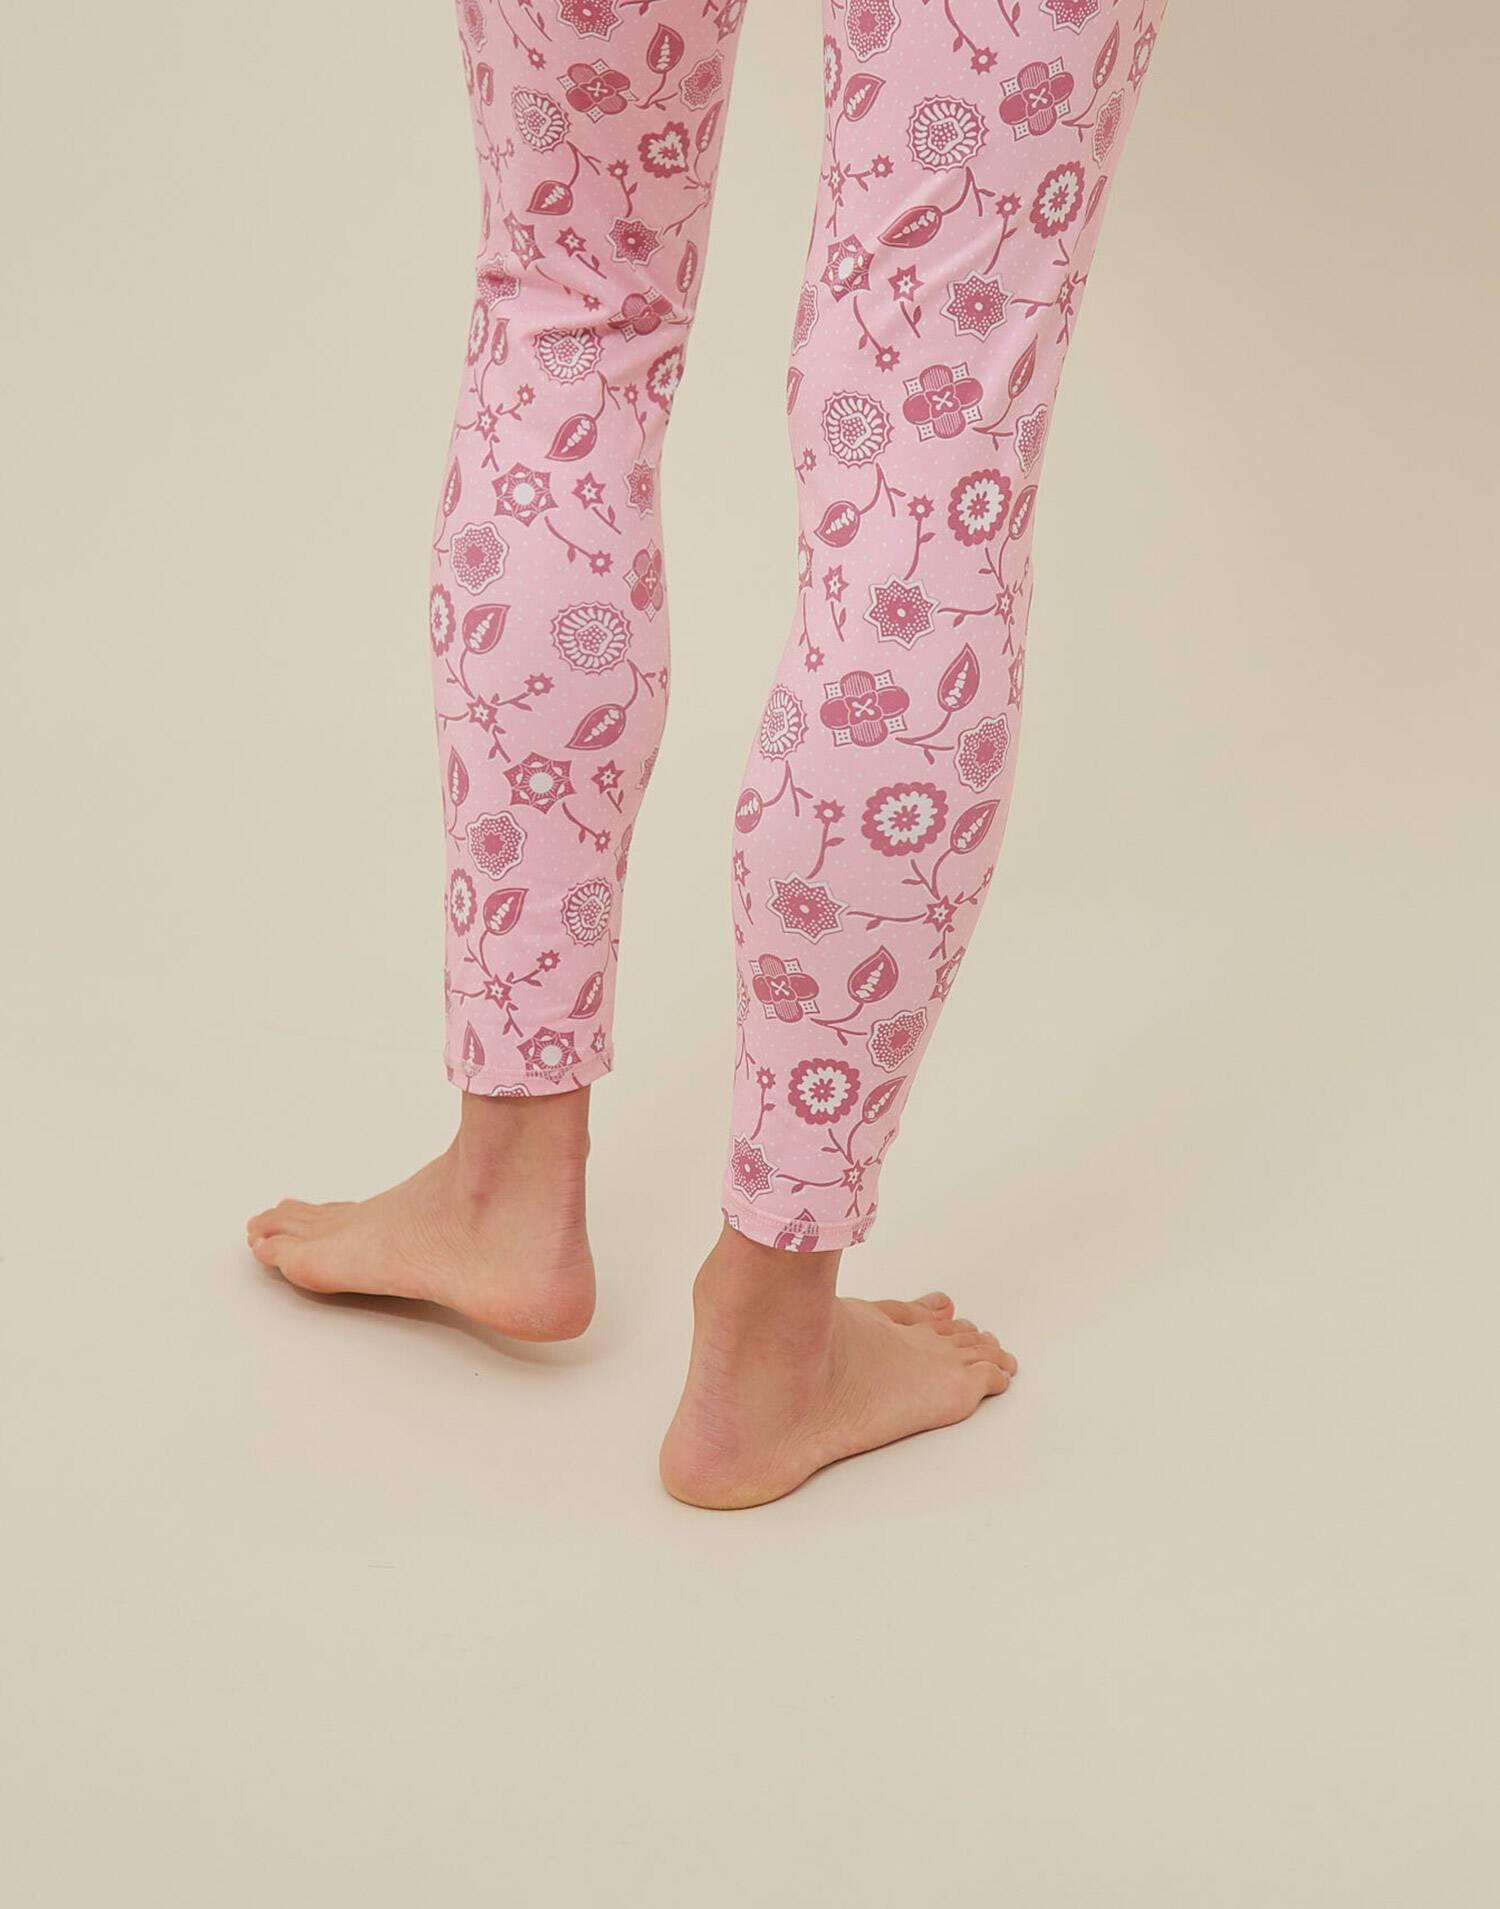 Pink yoga legging by natura